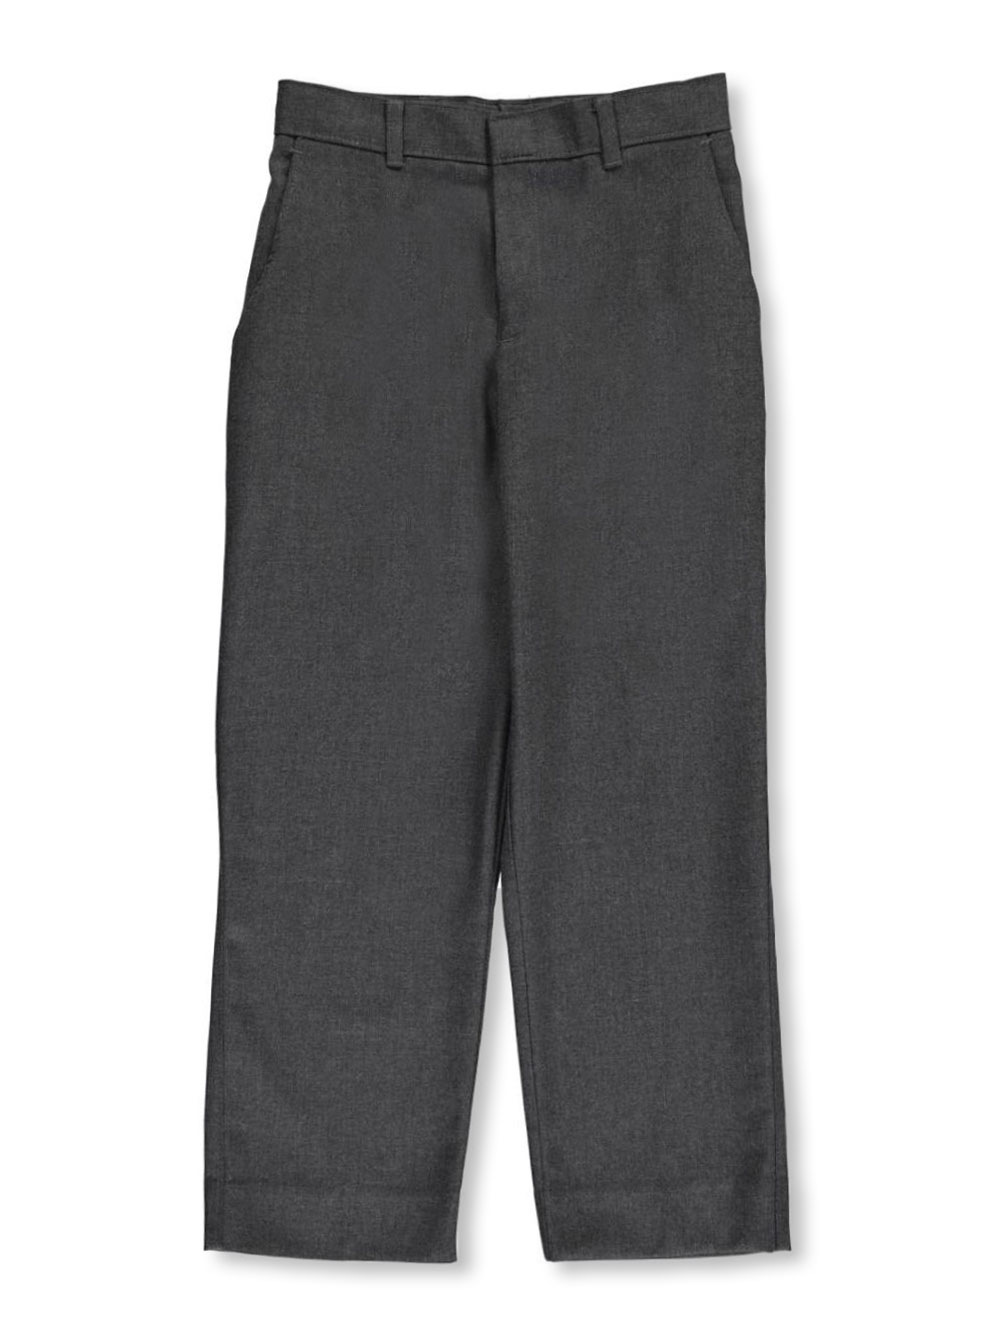 Rifle Little Boys Flat Front Pants